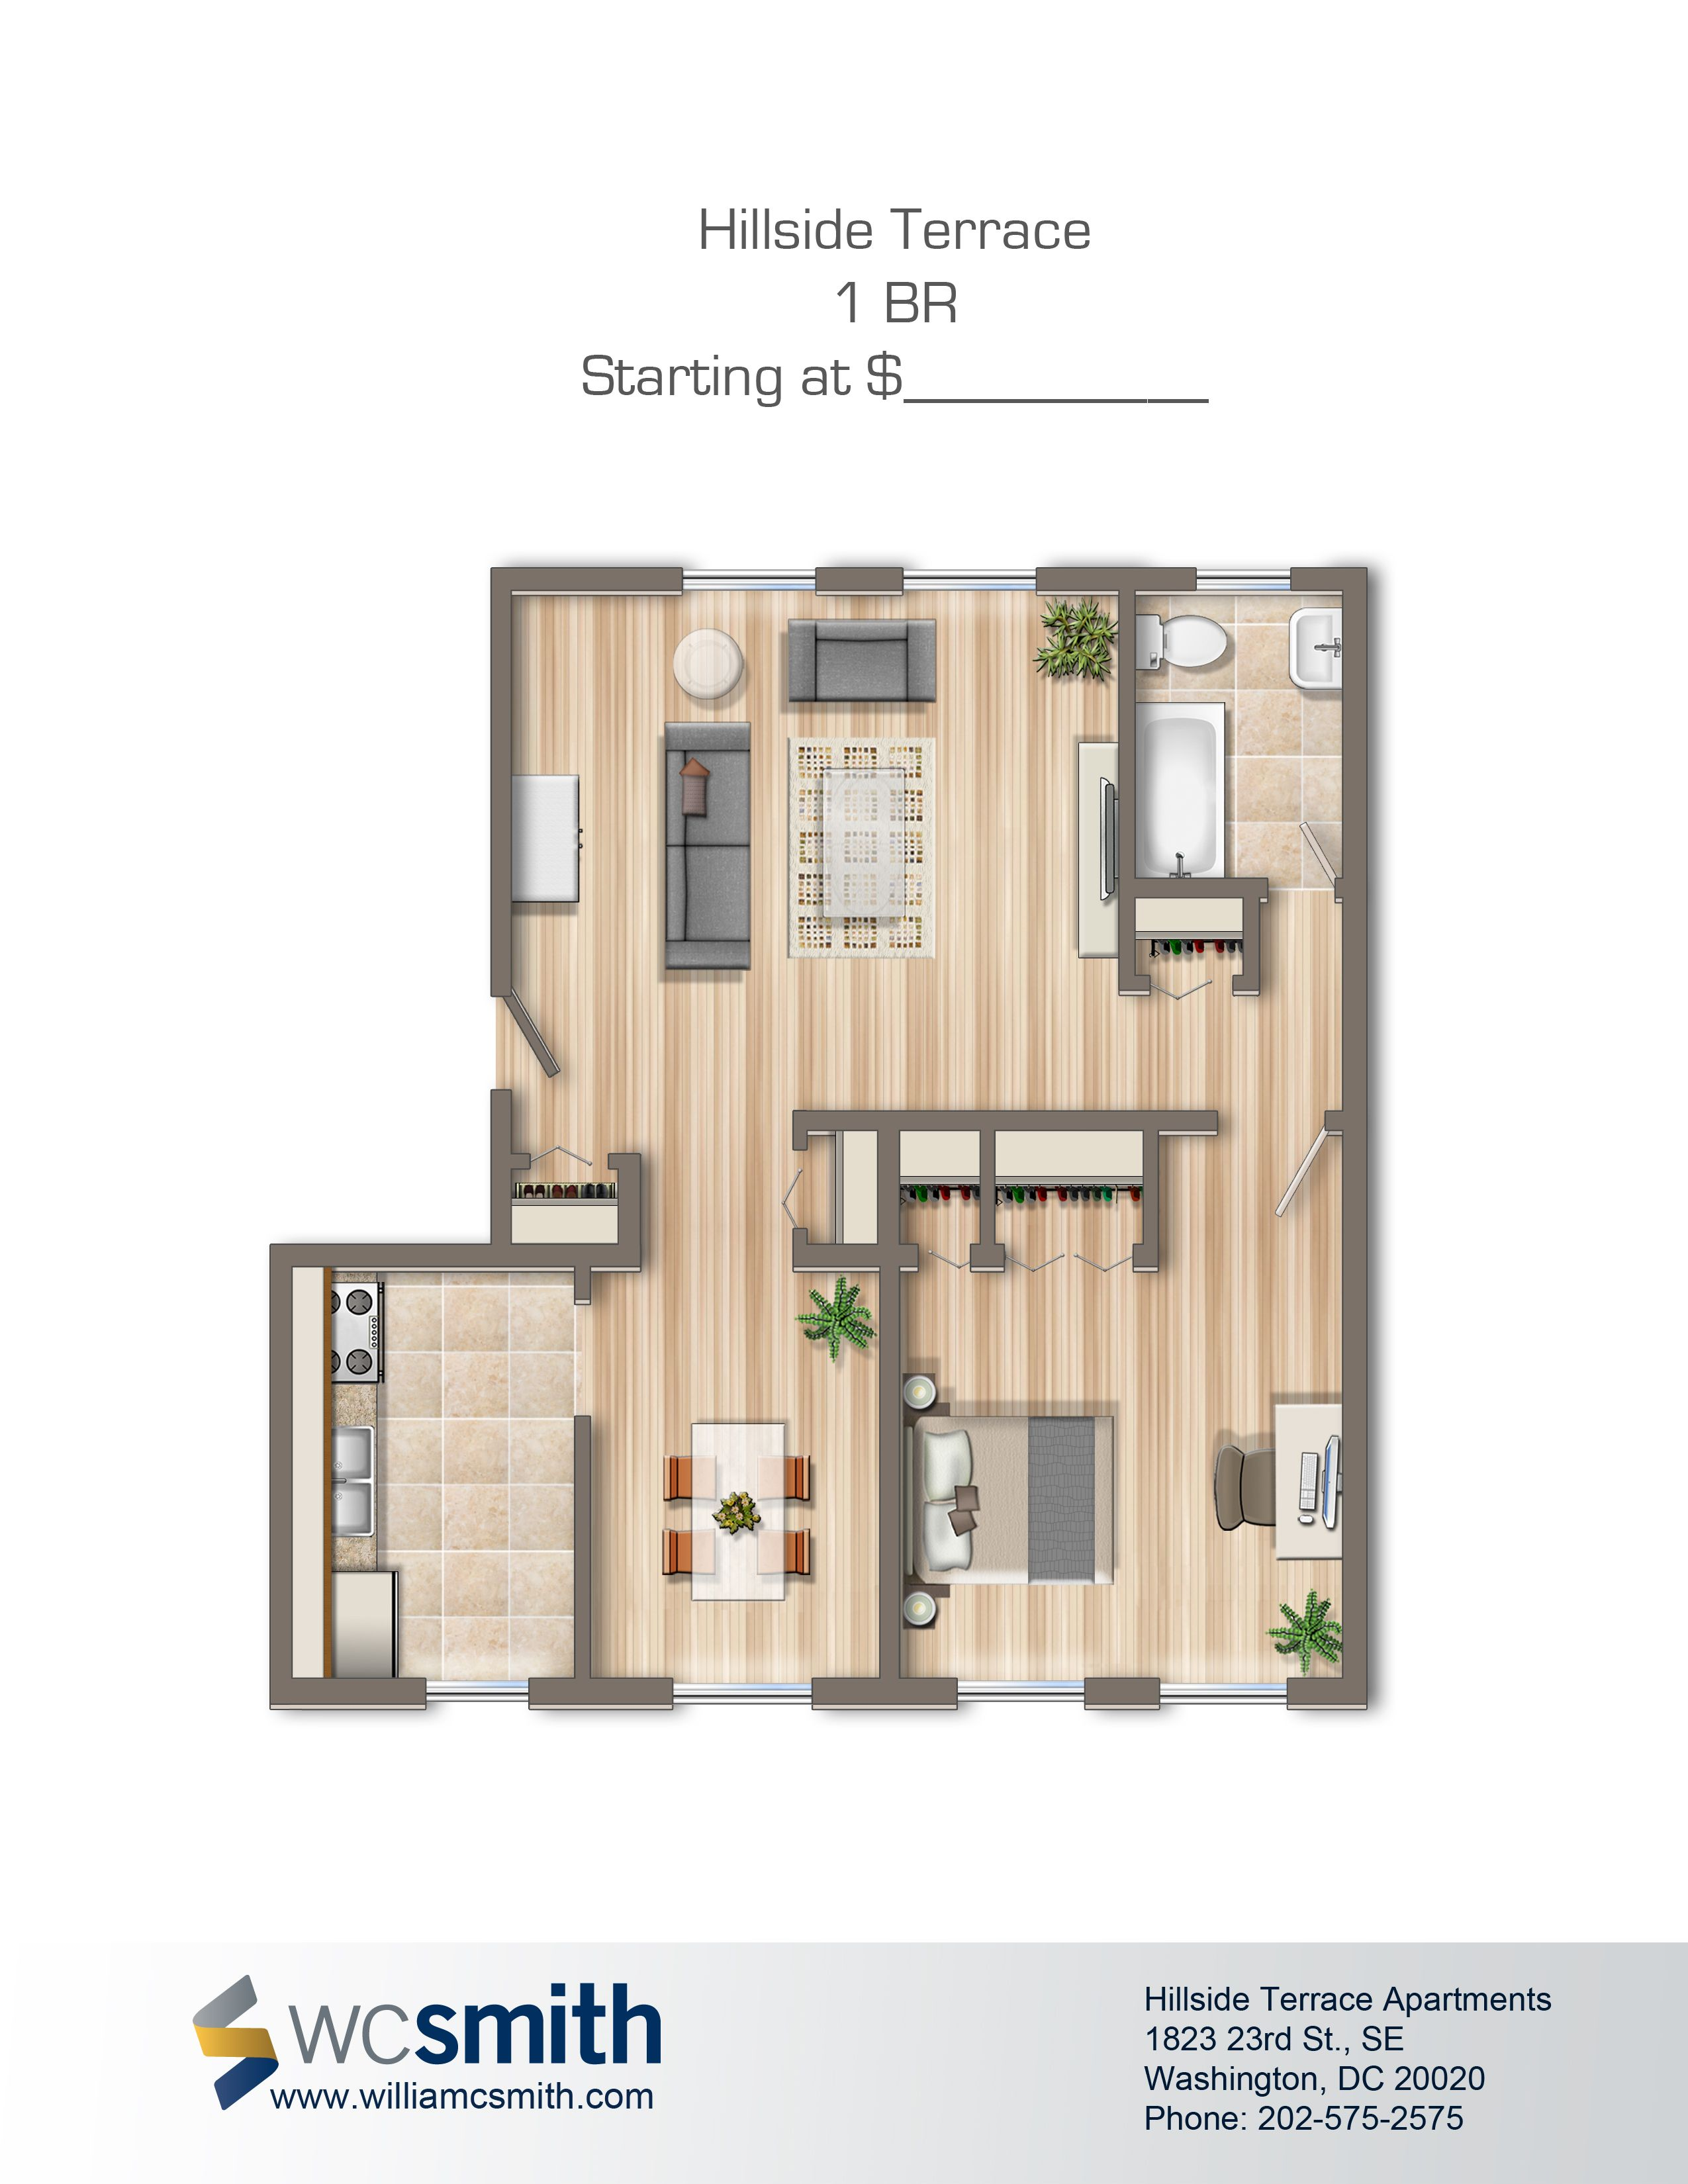 Hillside Terrace Apartments In Washington DC Apartment